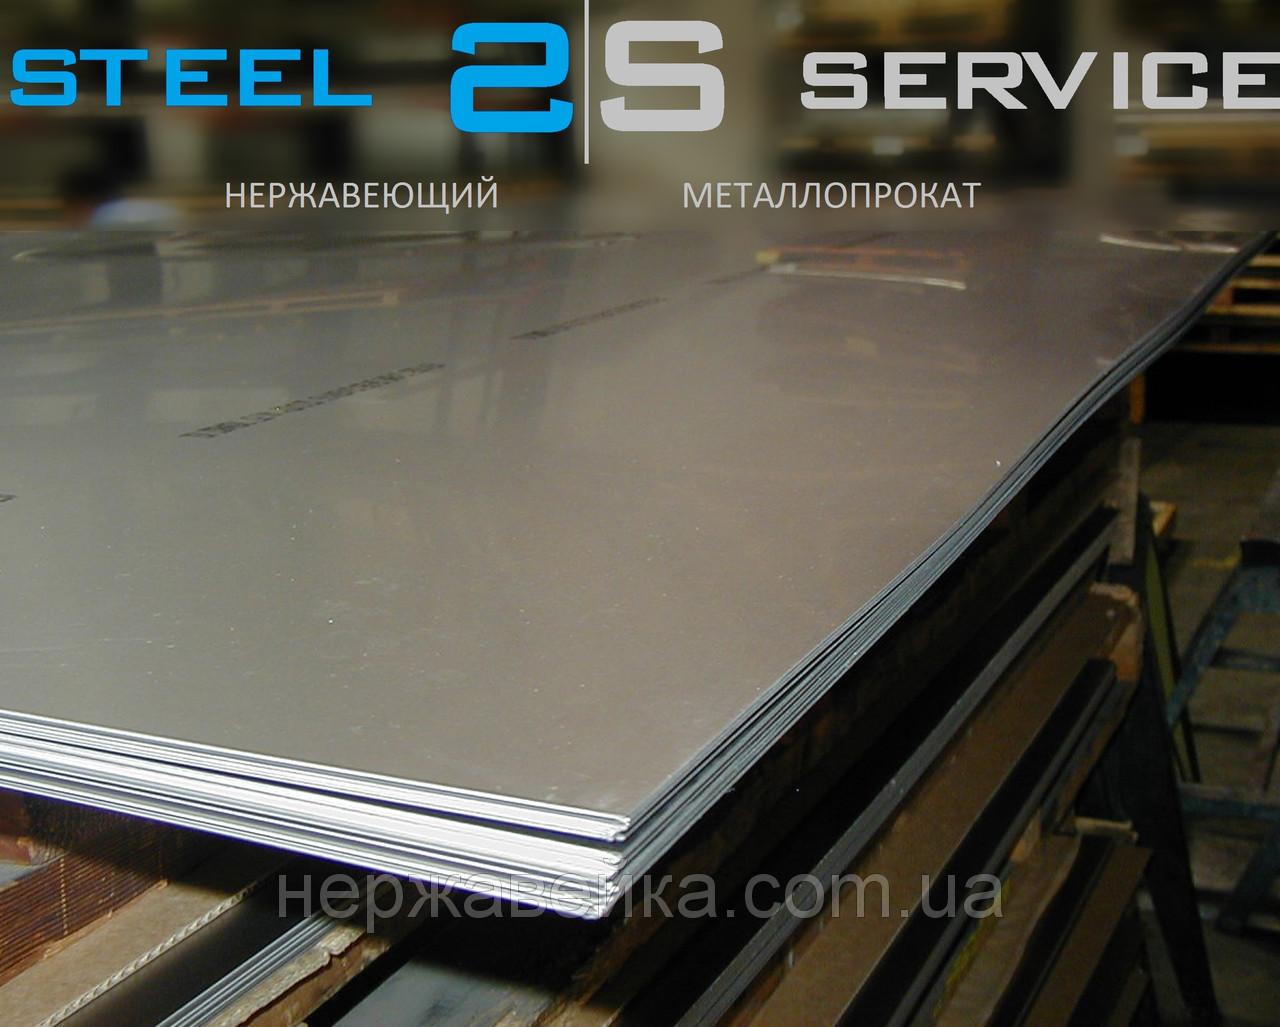 Нержавейка лист 4х1500х6000мм  AISI 316L(03Х17Н14М3) 2B - матовый,  кислотостойкий